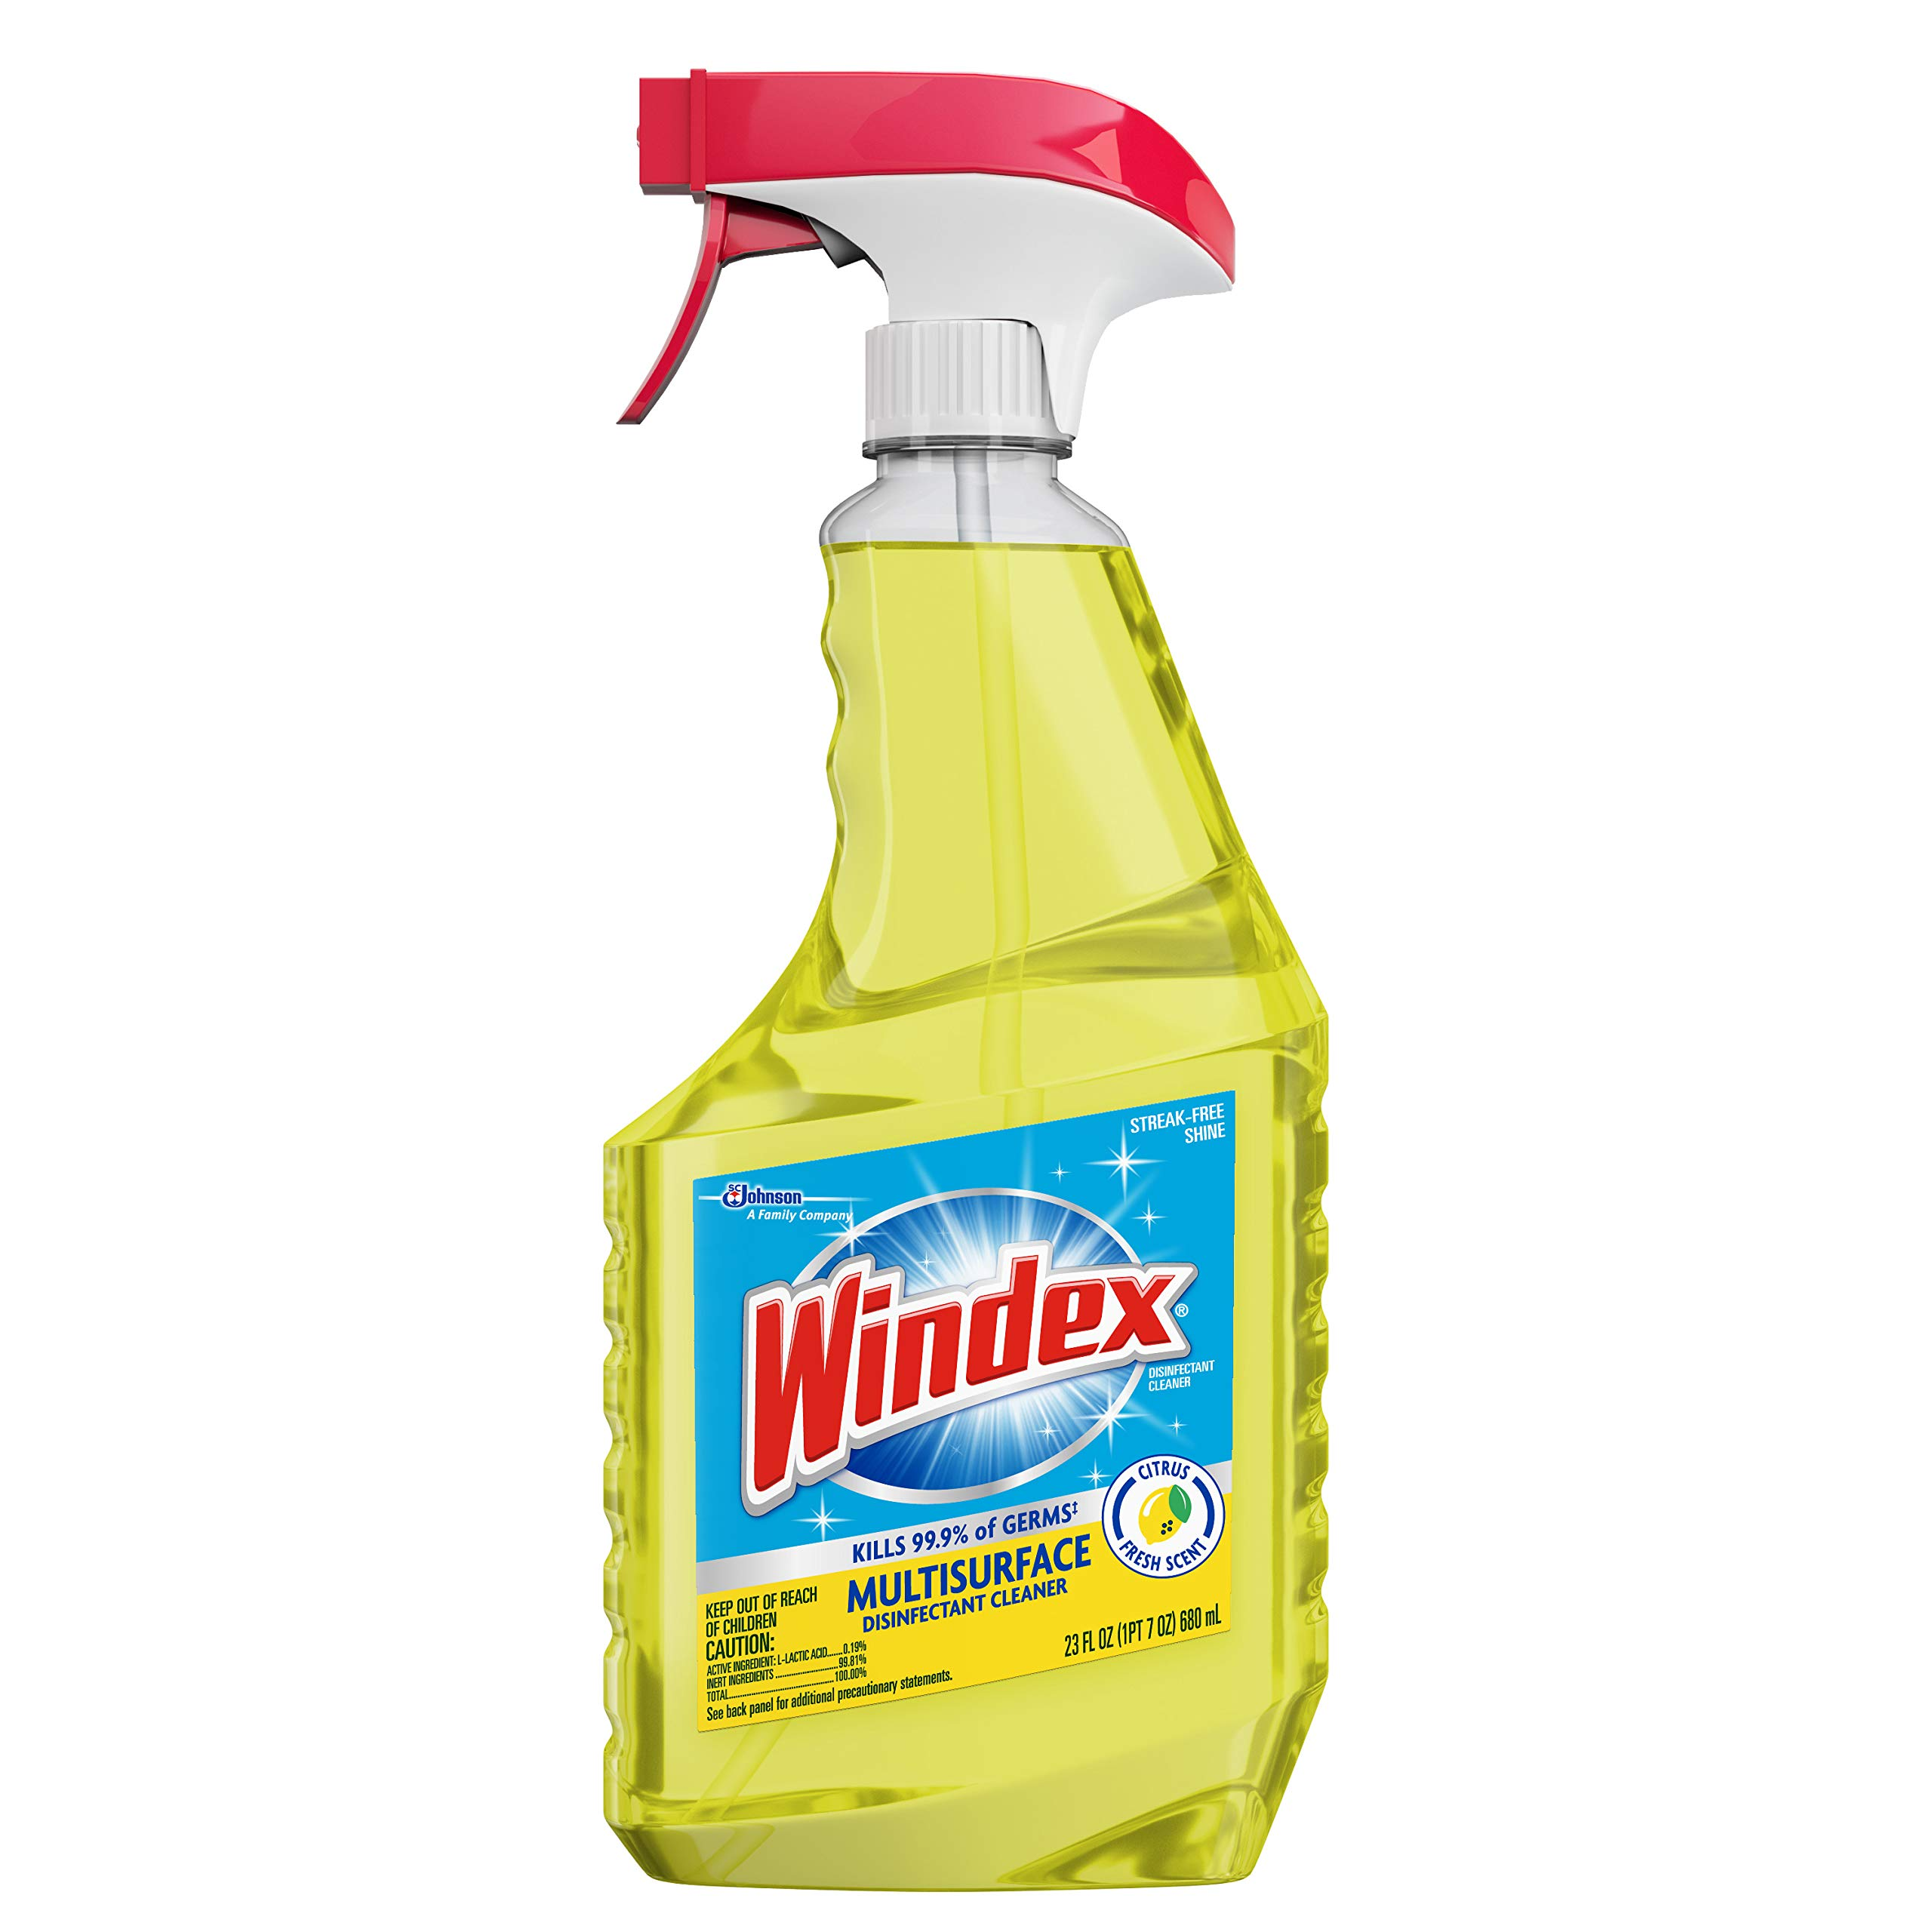 Windex Multi-Surface Disinfectant Cleaner Trigger Bottle, Citrus, 23 fl oz